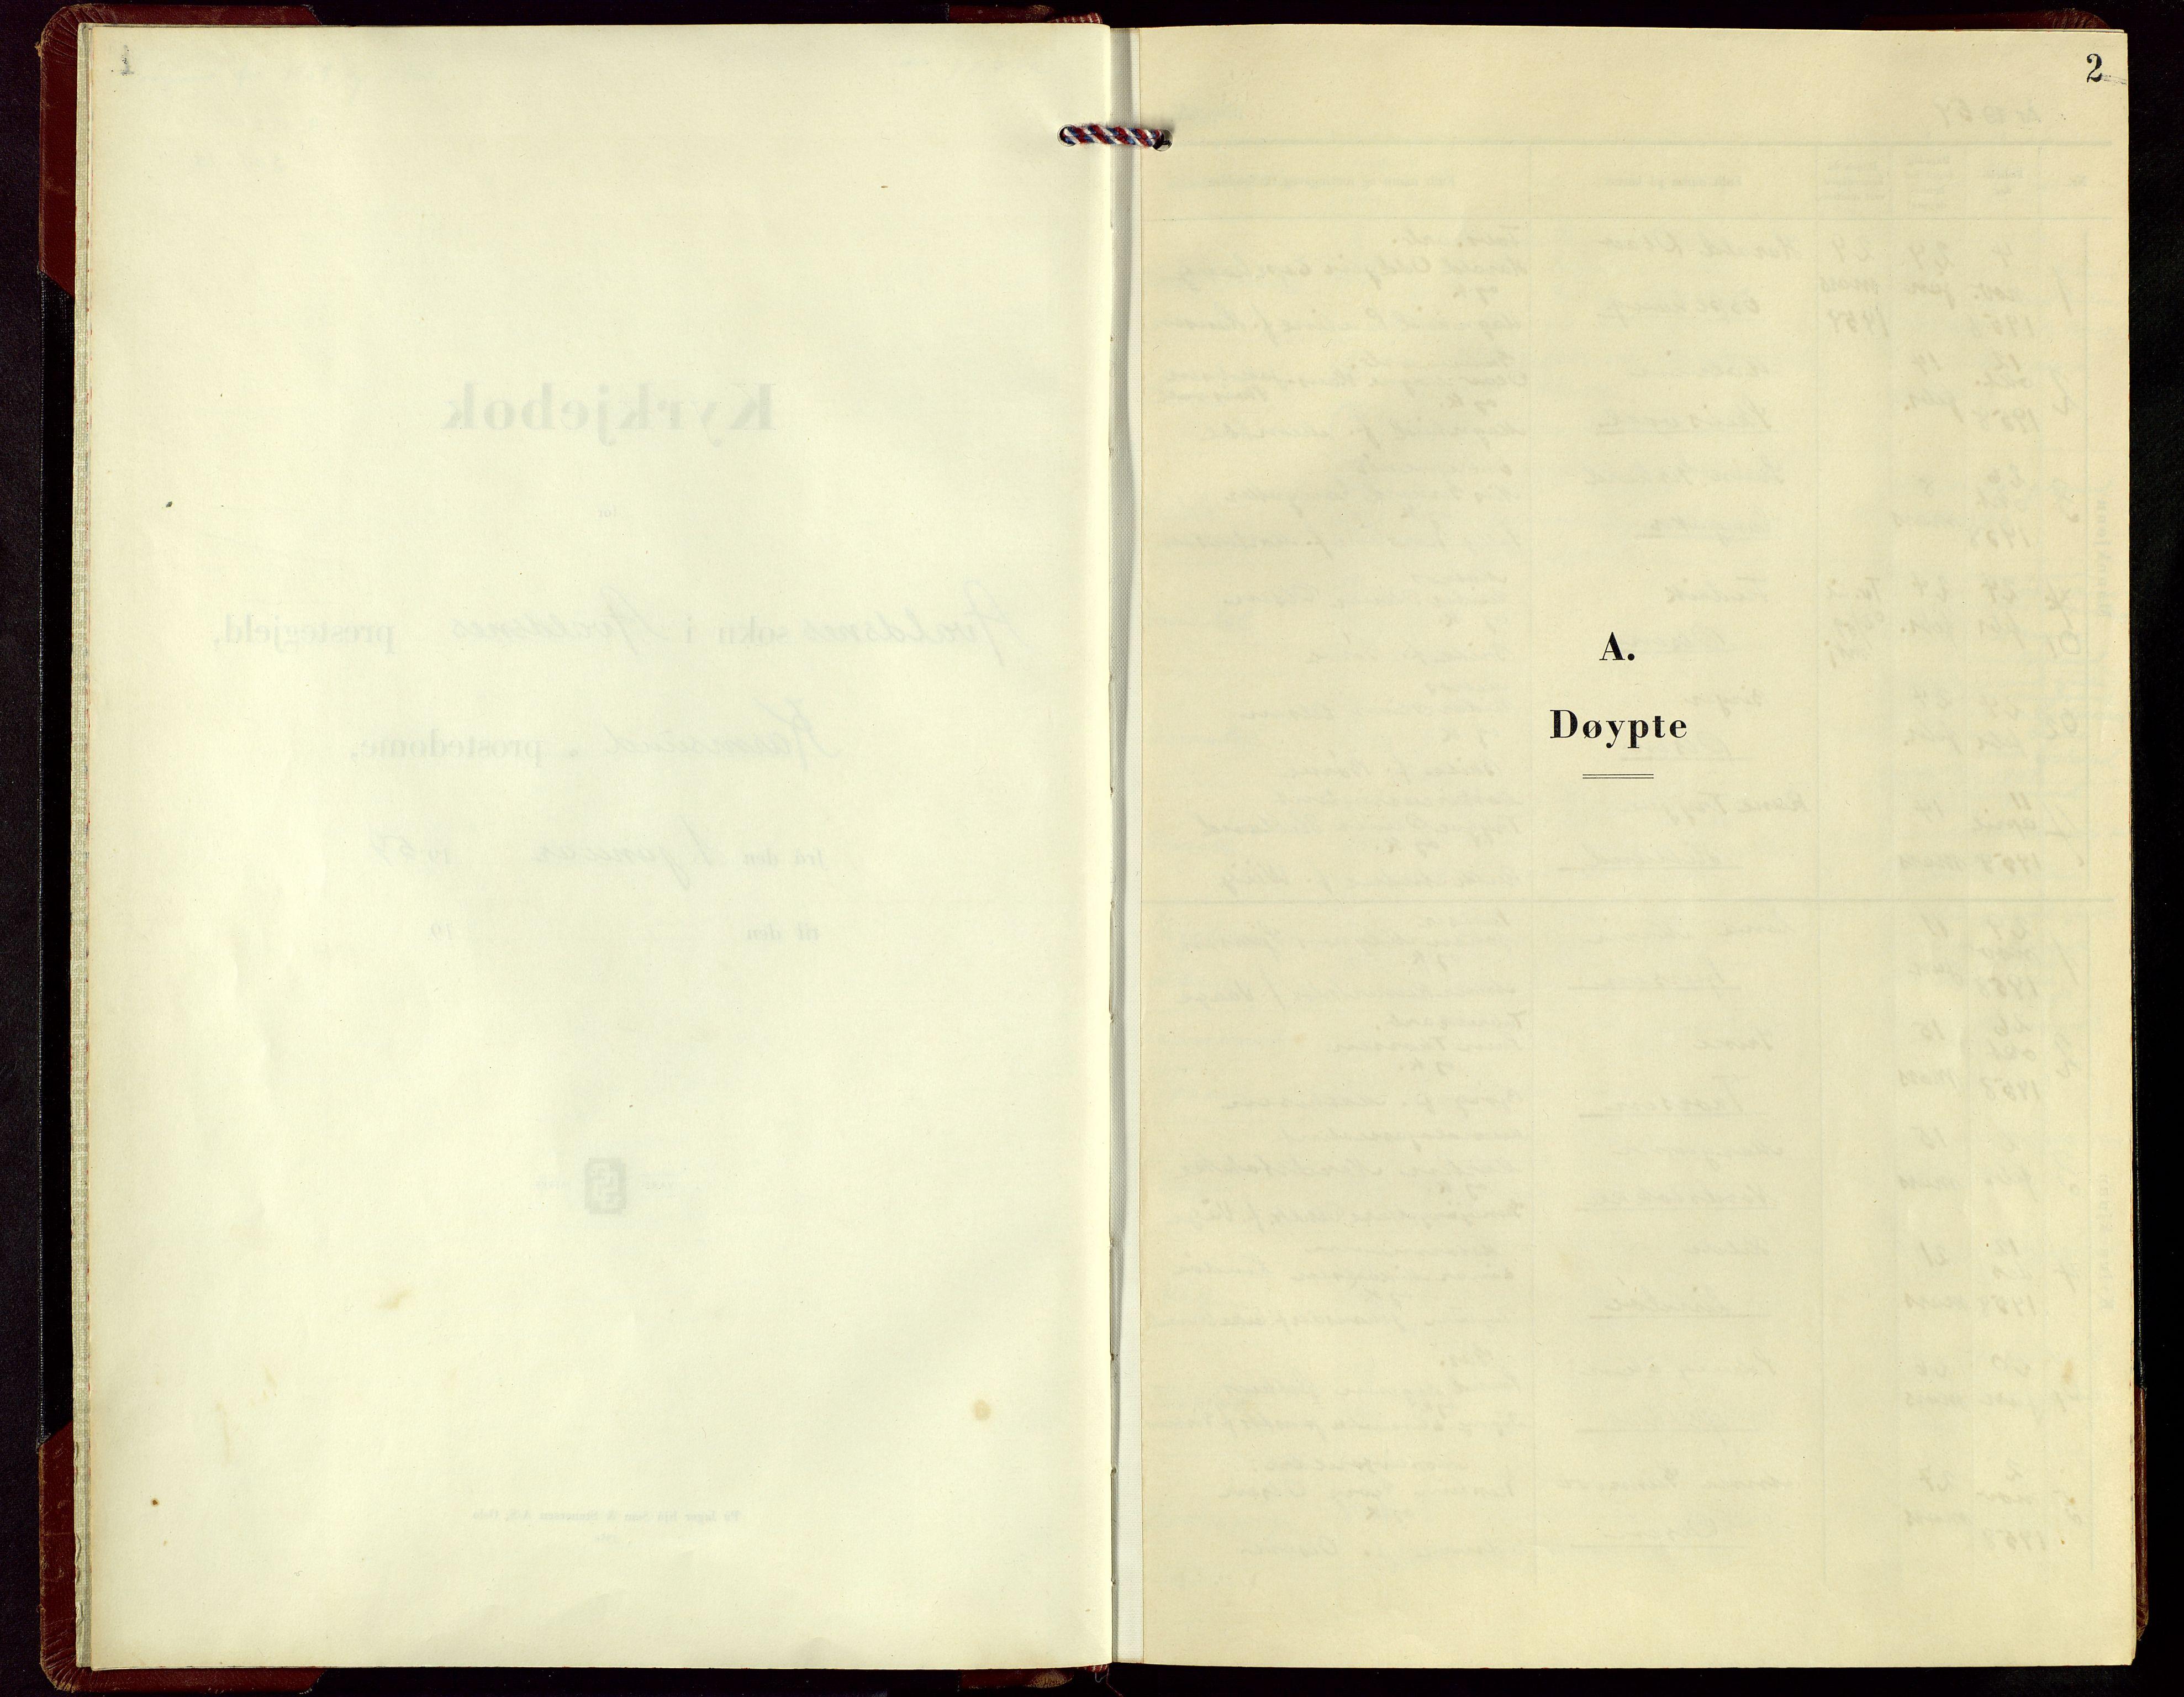 SAST, Avaldsnes sokneprestkontor, H/Ha/Hab/L0010: Klokkerbok nr. B 10, 1956-1973, s. 2